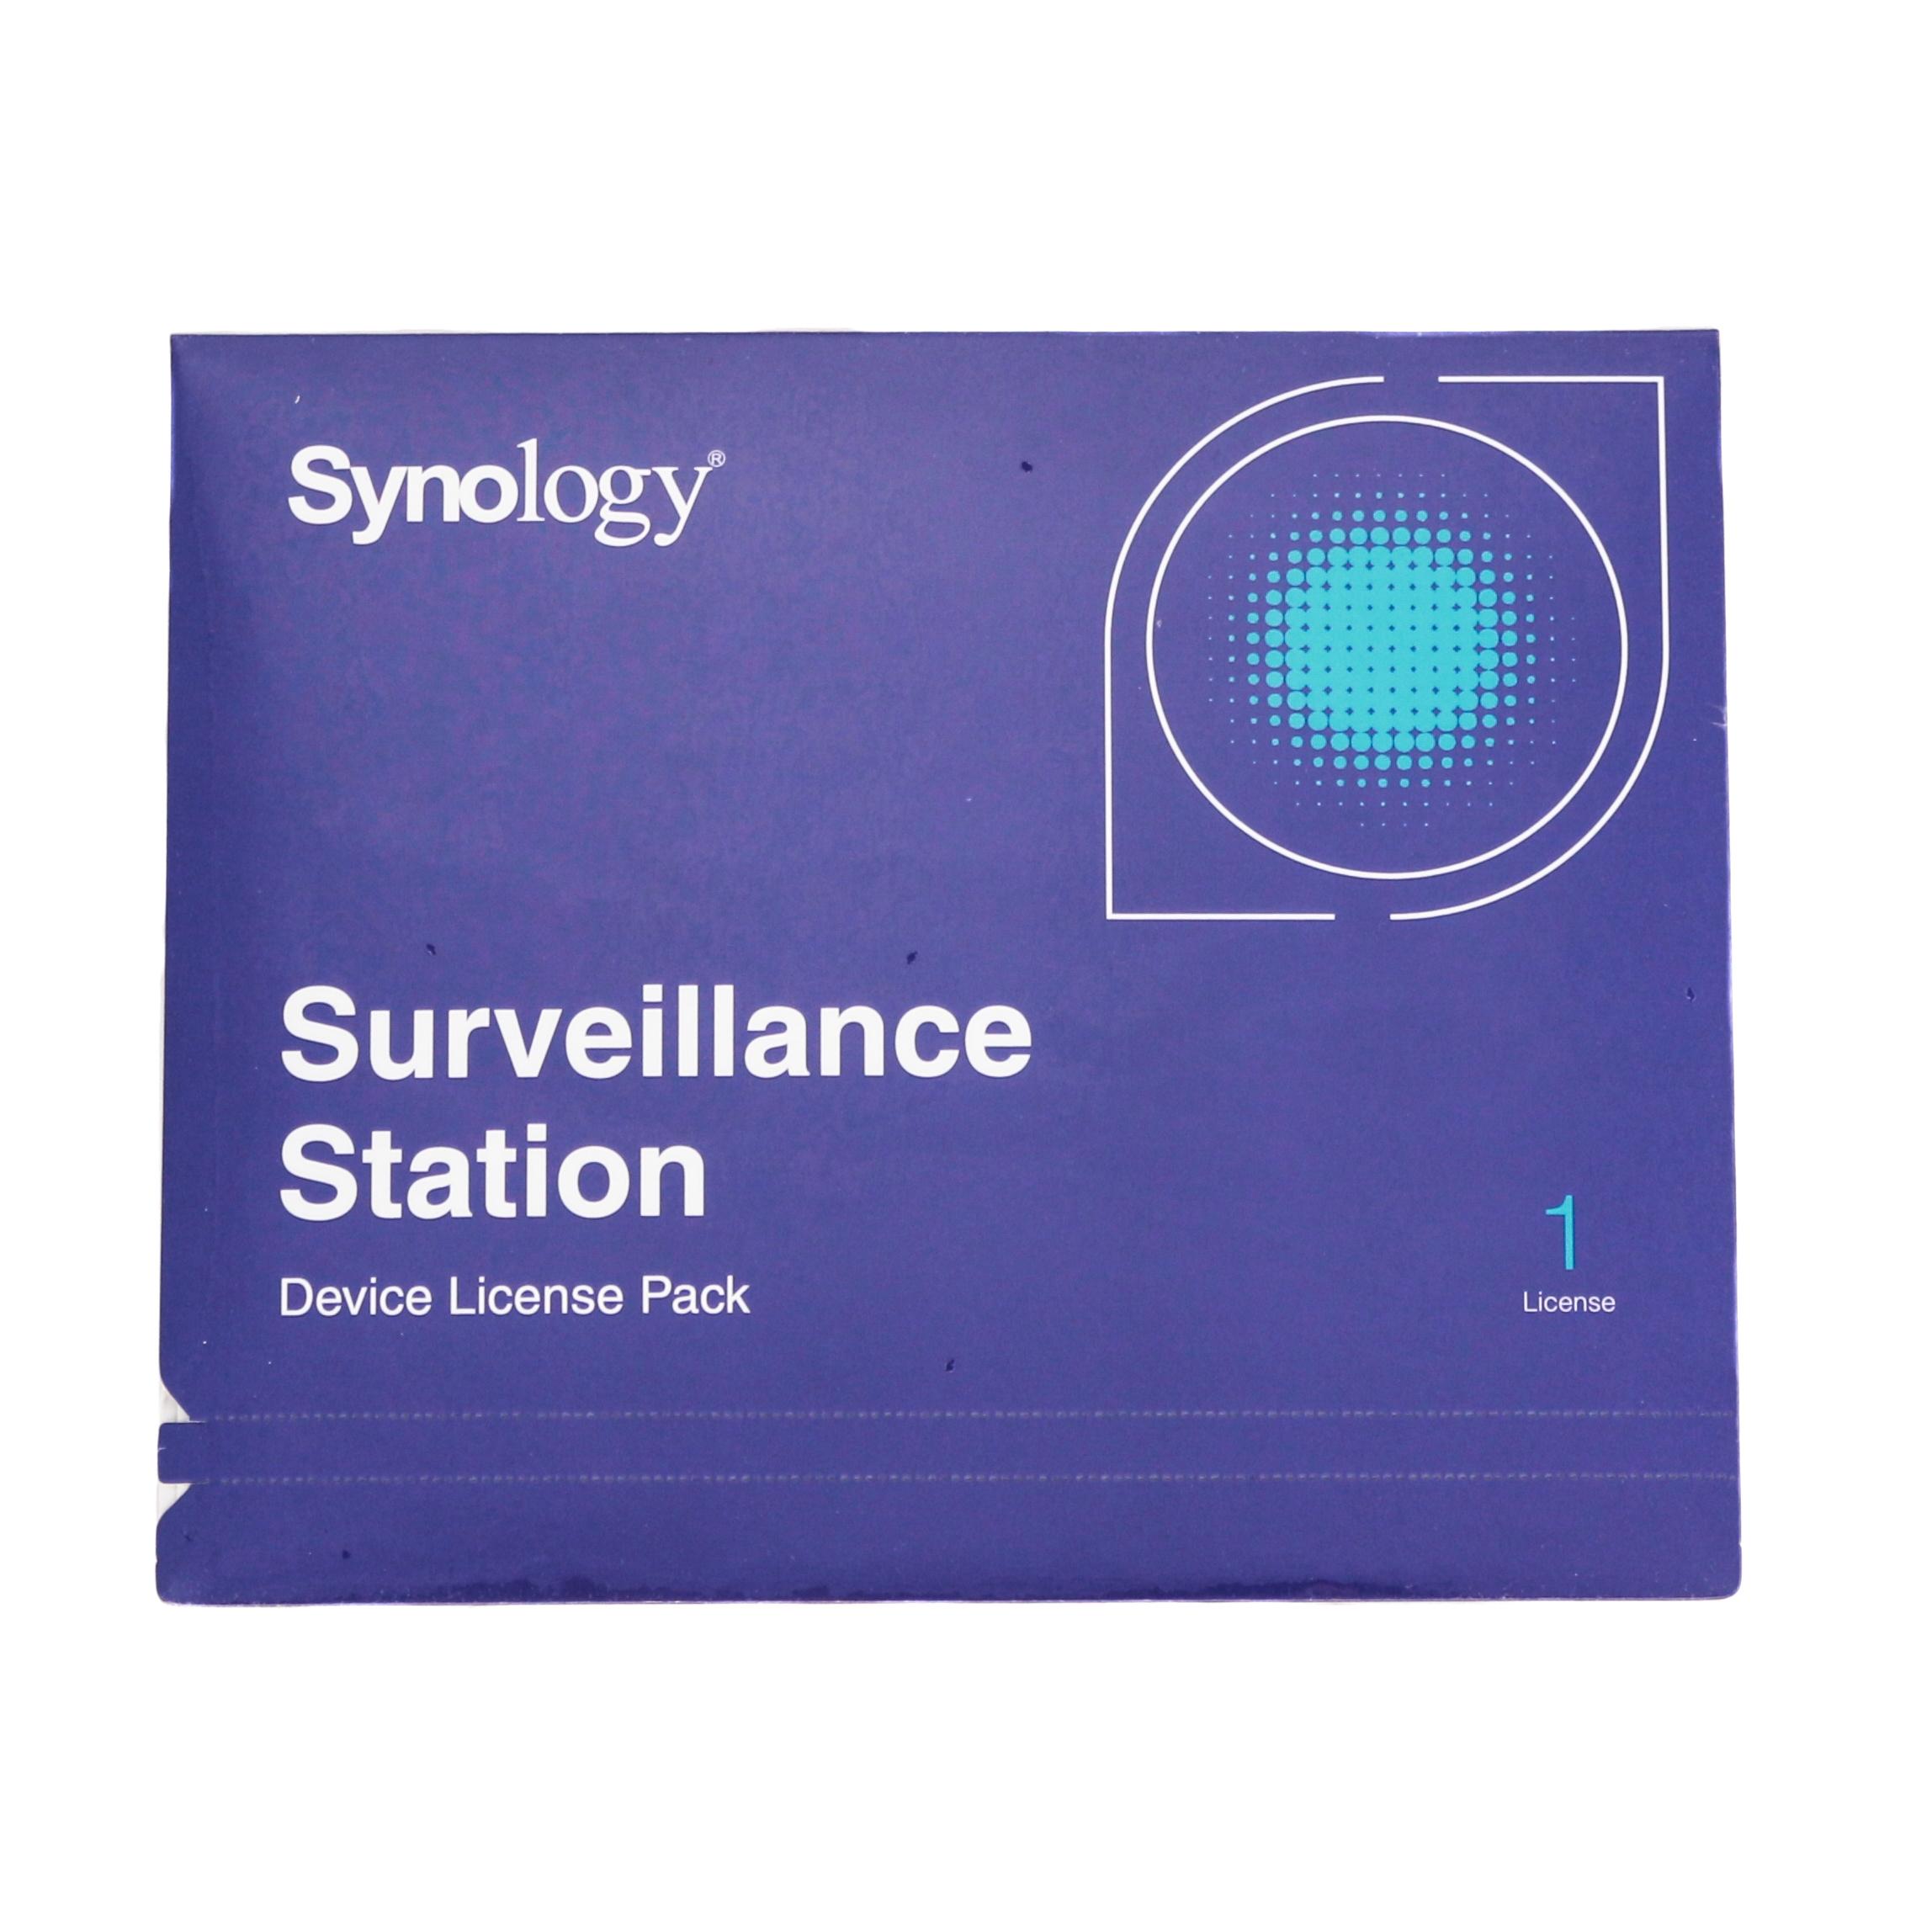 Synology 1 Camera License Pack 166 Use Ip Ltd